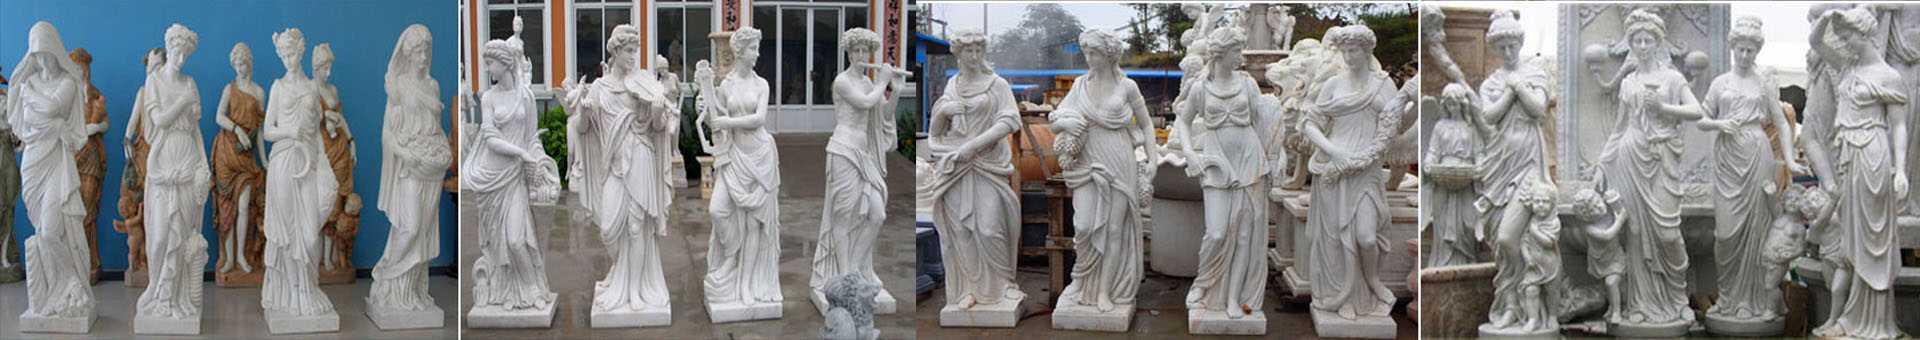 Four Season Statue